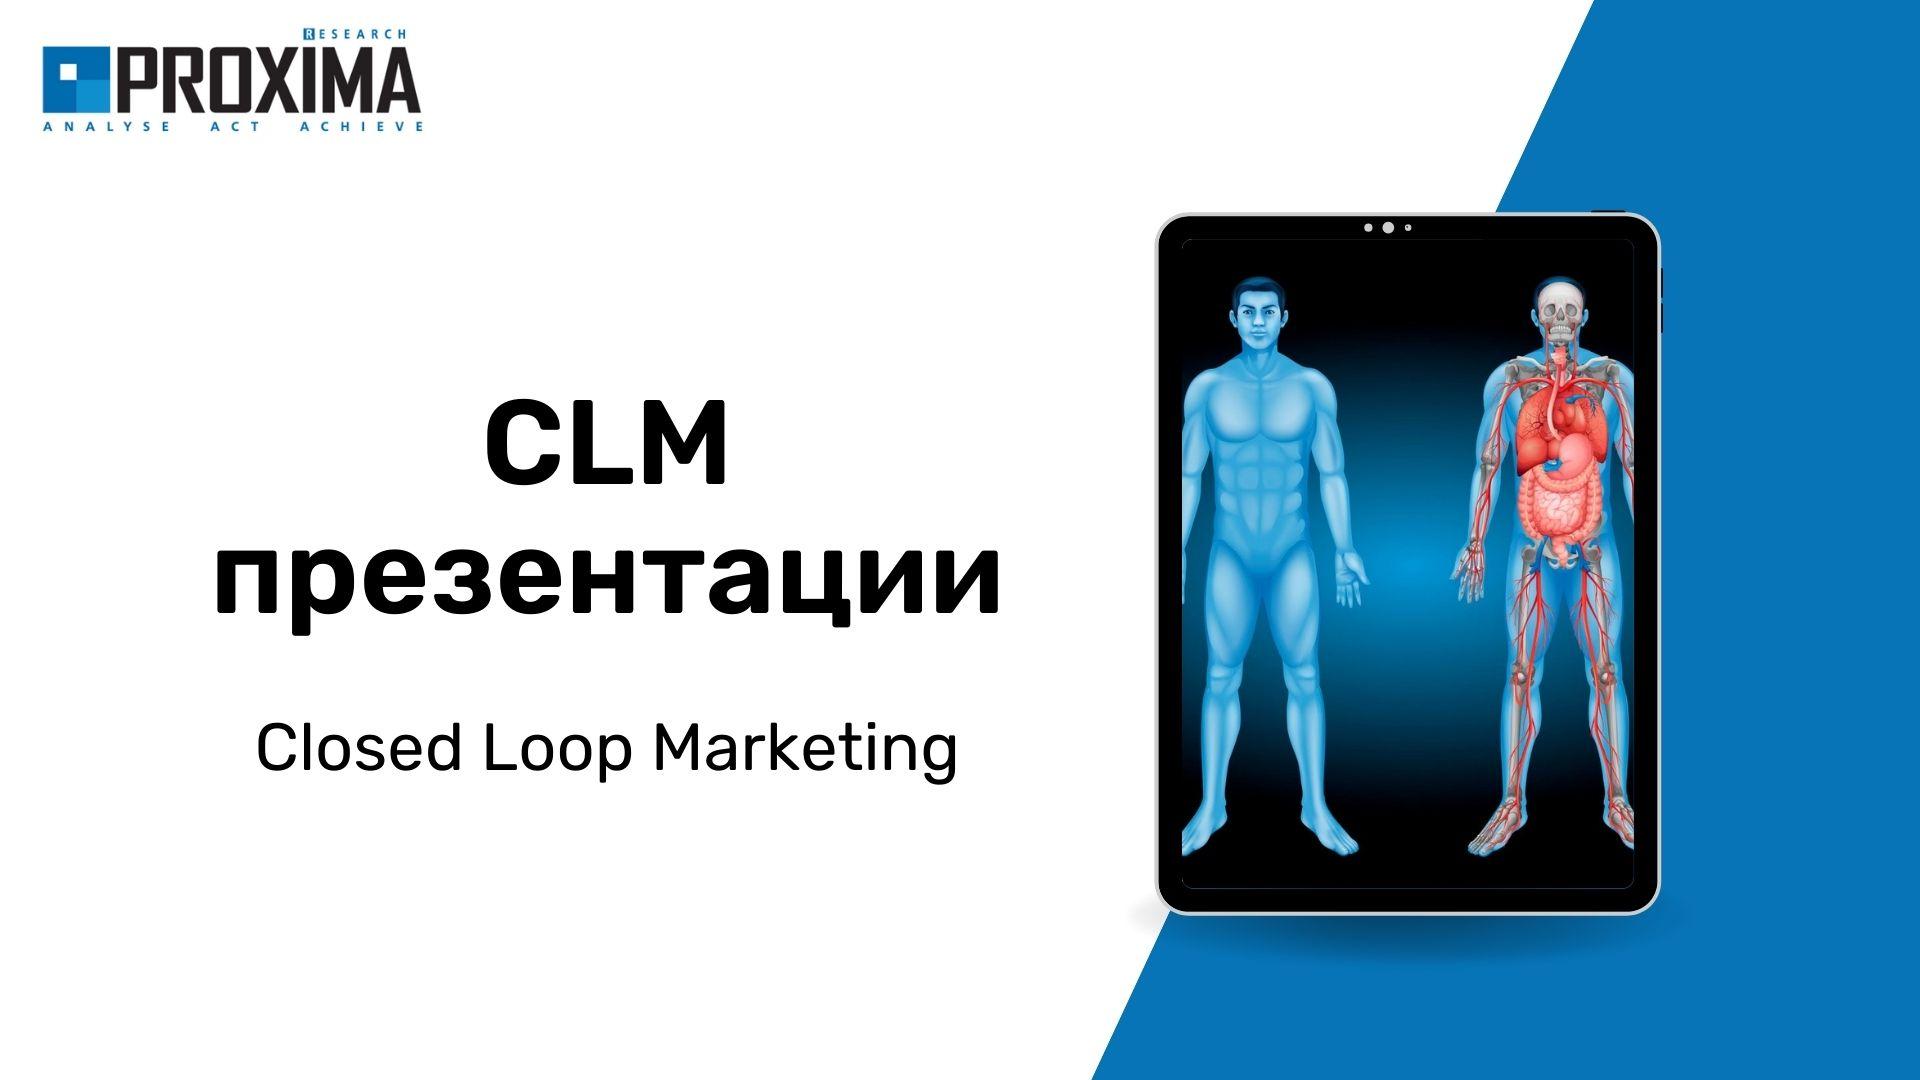 CLM — маркетинг замкнутого цикла